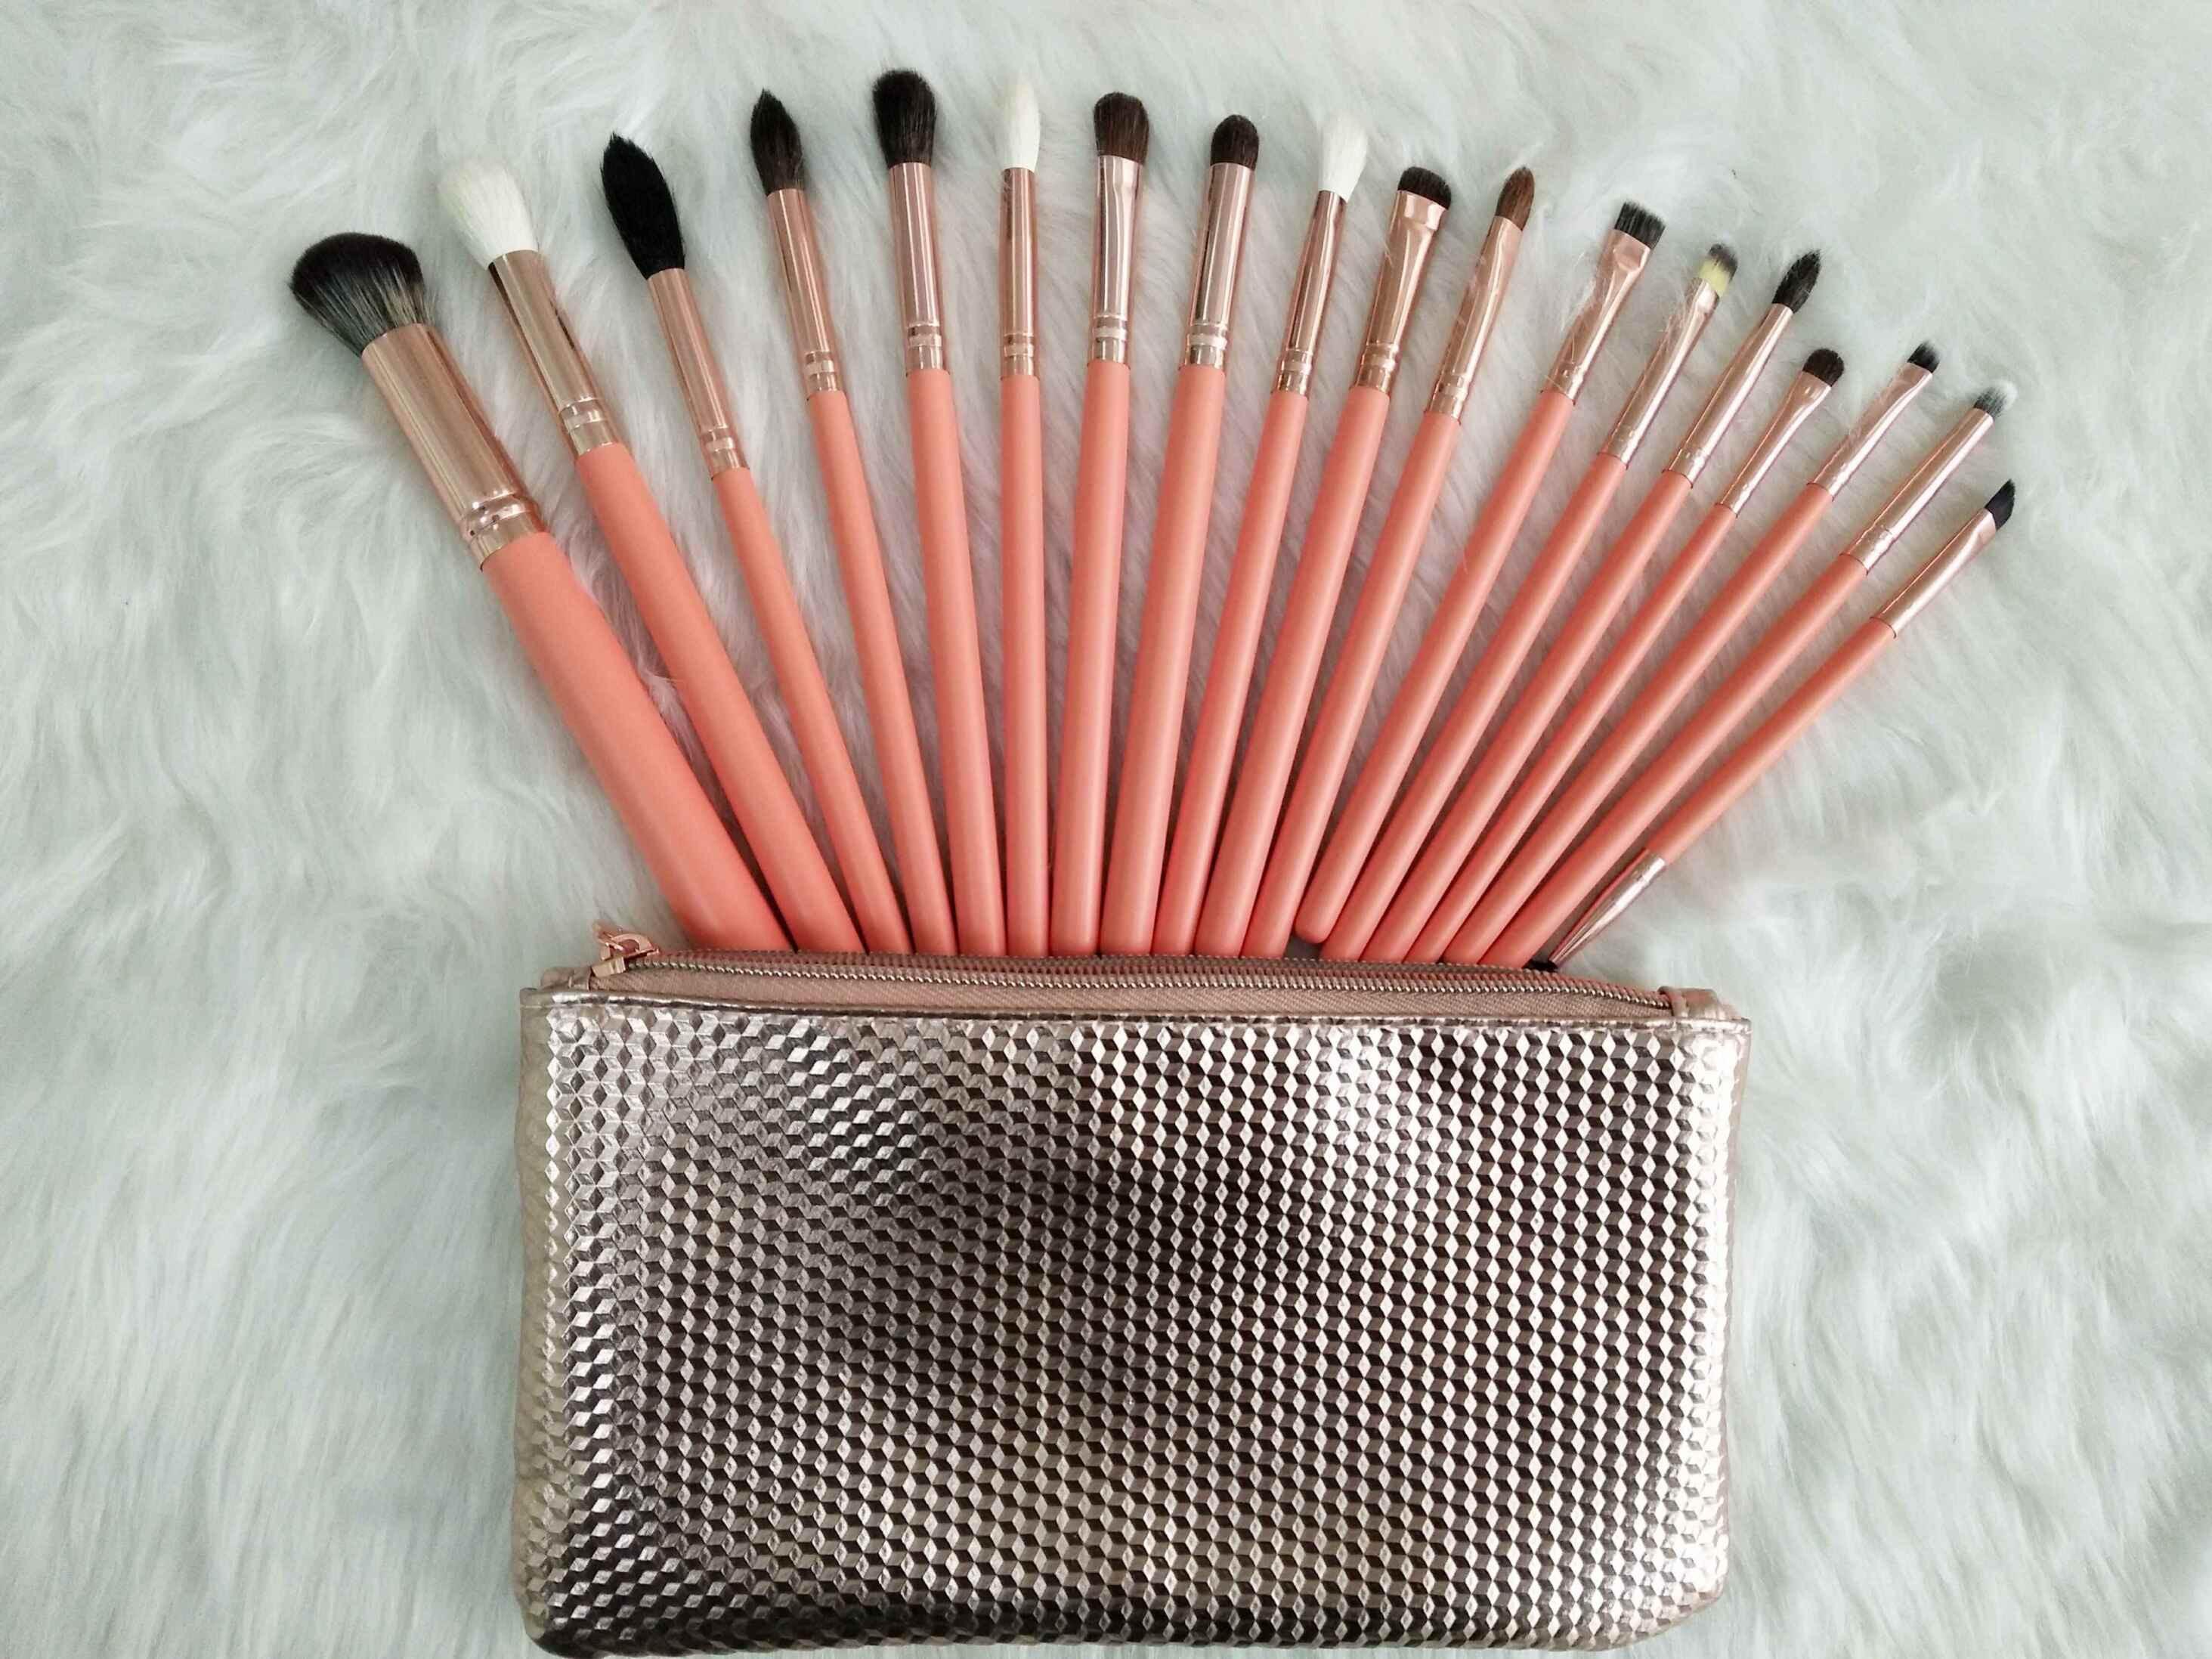 Fashion Daily Using Cosmetic Brush/Makeup Brushes